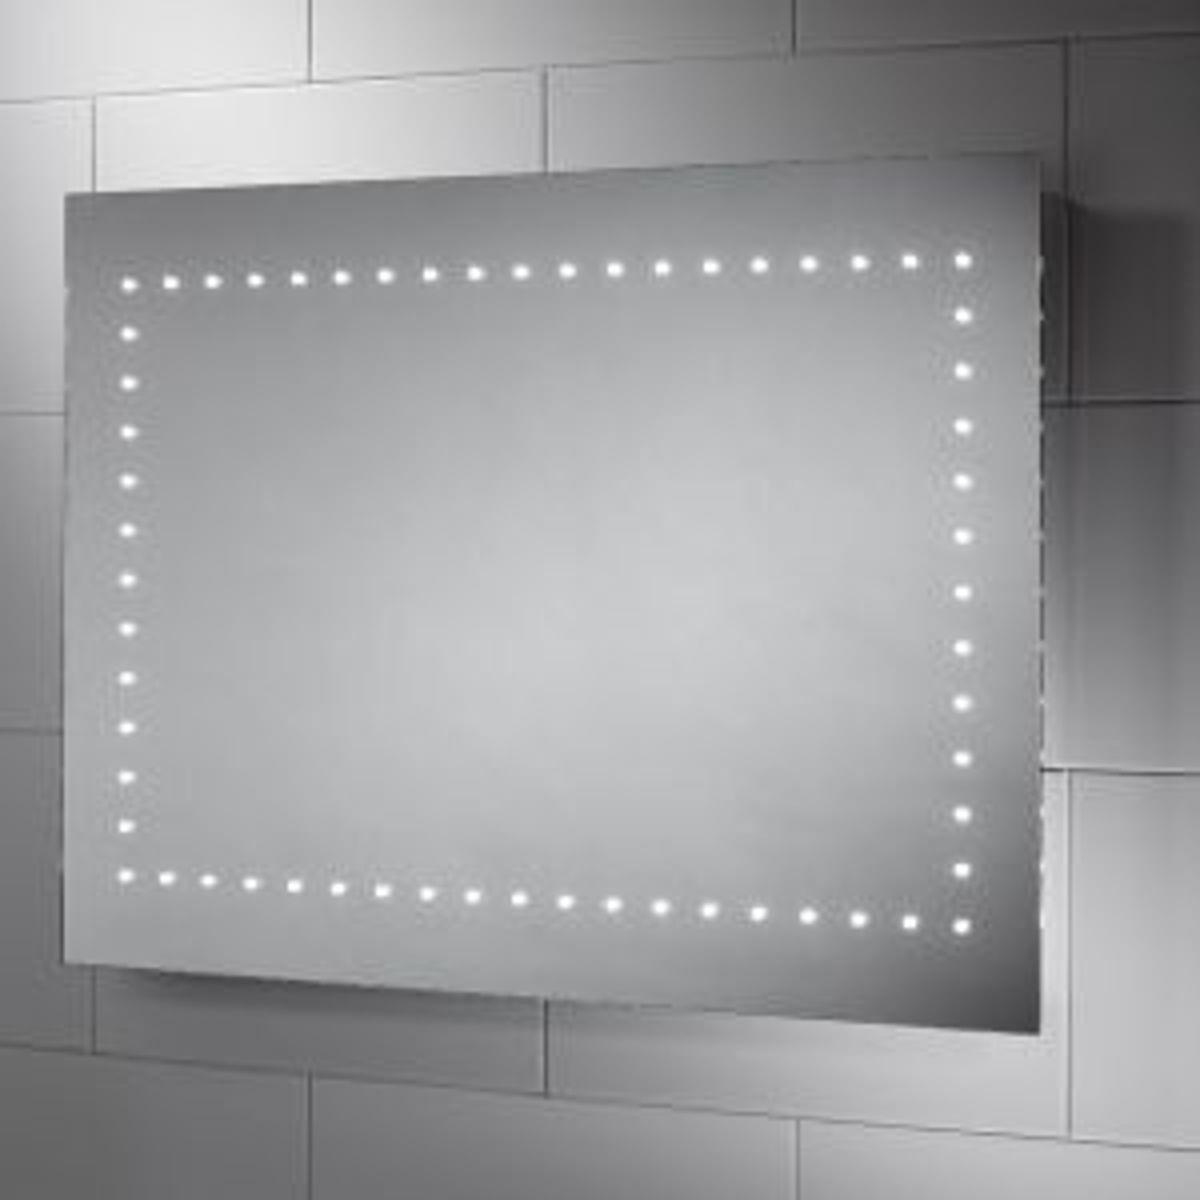 Sensio Bronte LED Mirror with Demister Pad Landscape SE30576C0.1